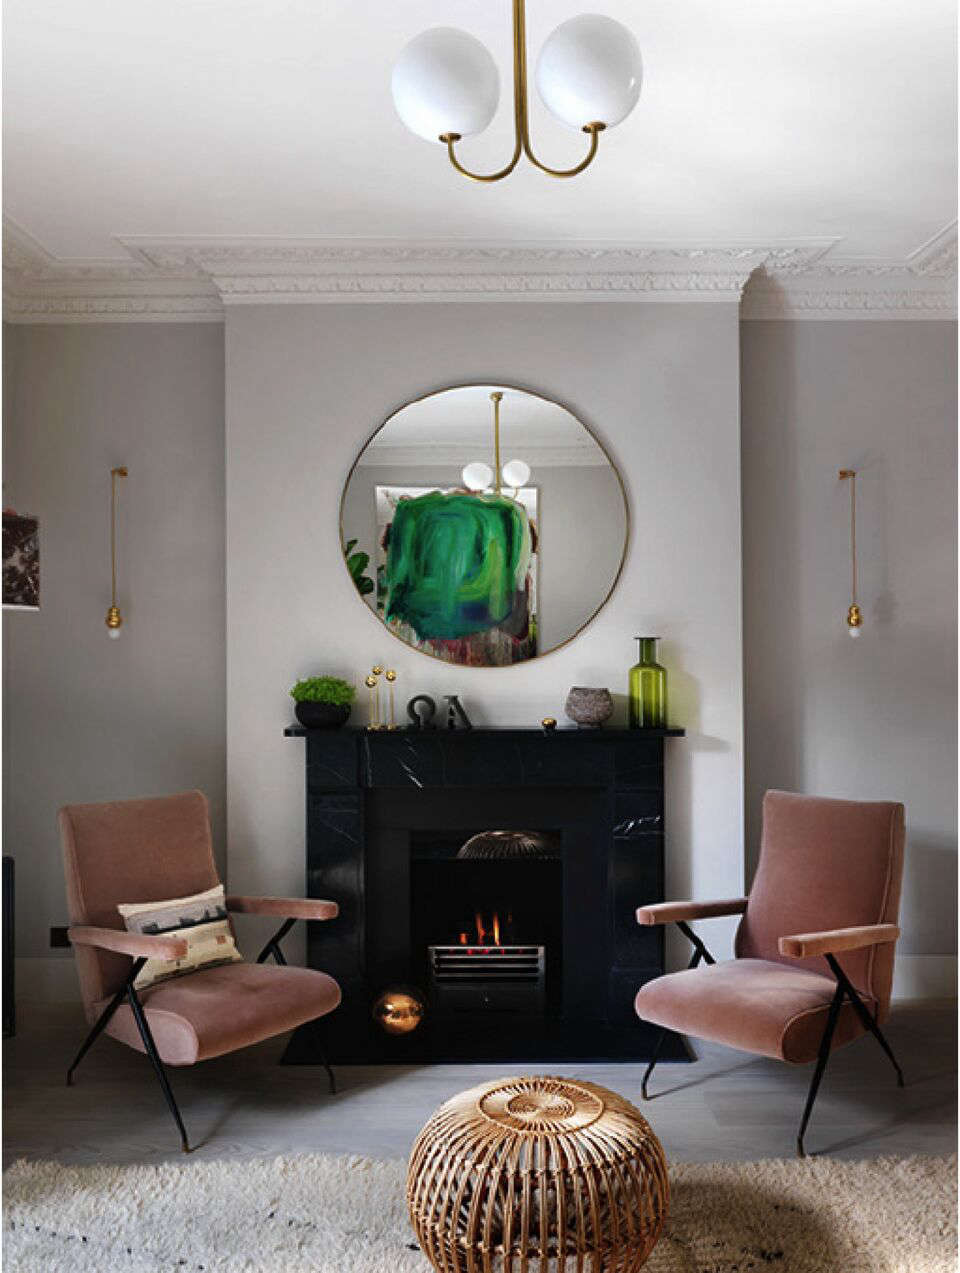 A Notting Hill Townhouse Tailored for Living by Charles Mellersh Dusty pink velvet upholstered vintage armchairs in a Notting Hill town house by interior designer Charles Mellersh   Remodelista